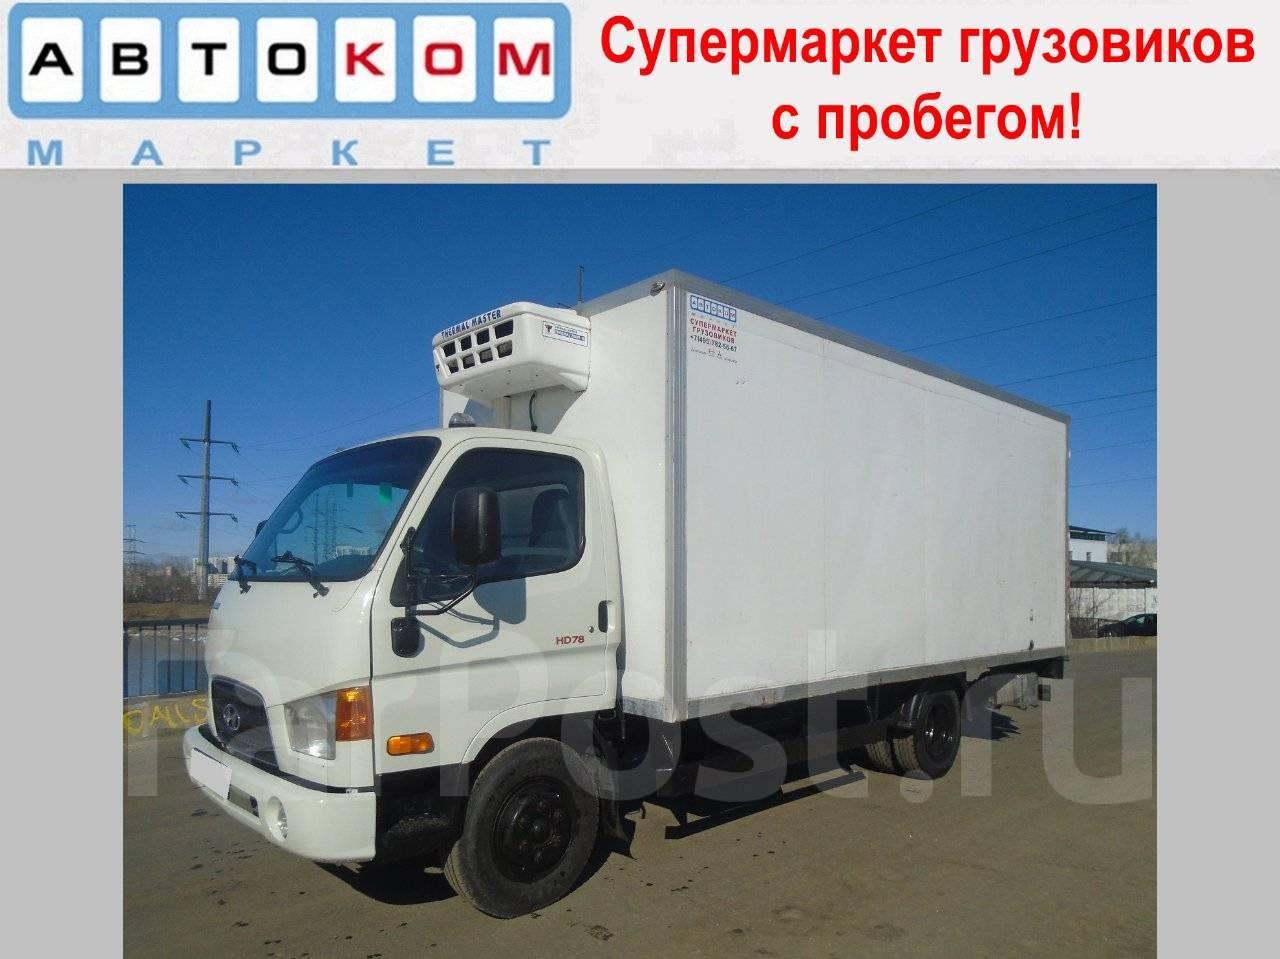 e2dd2b90aca87 Купить грузовик Hyundai HD78 ! Цены на грузовики 1, 3.5, 5, 10 тонн и  более. Фото